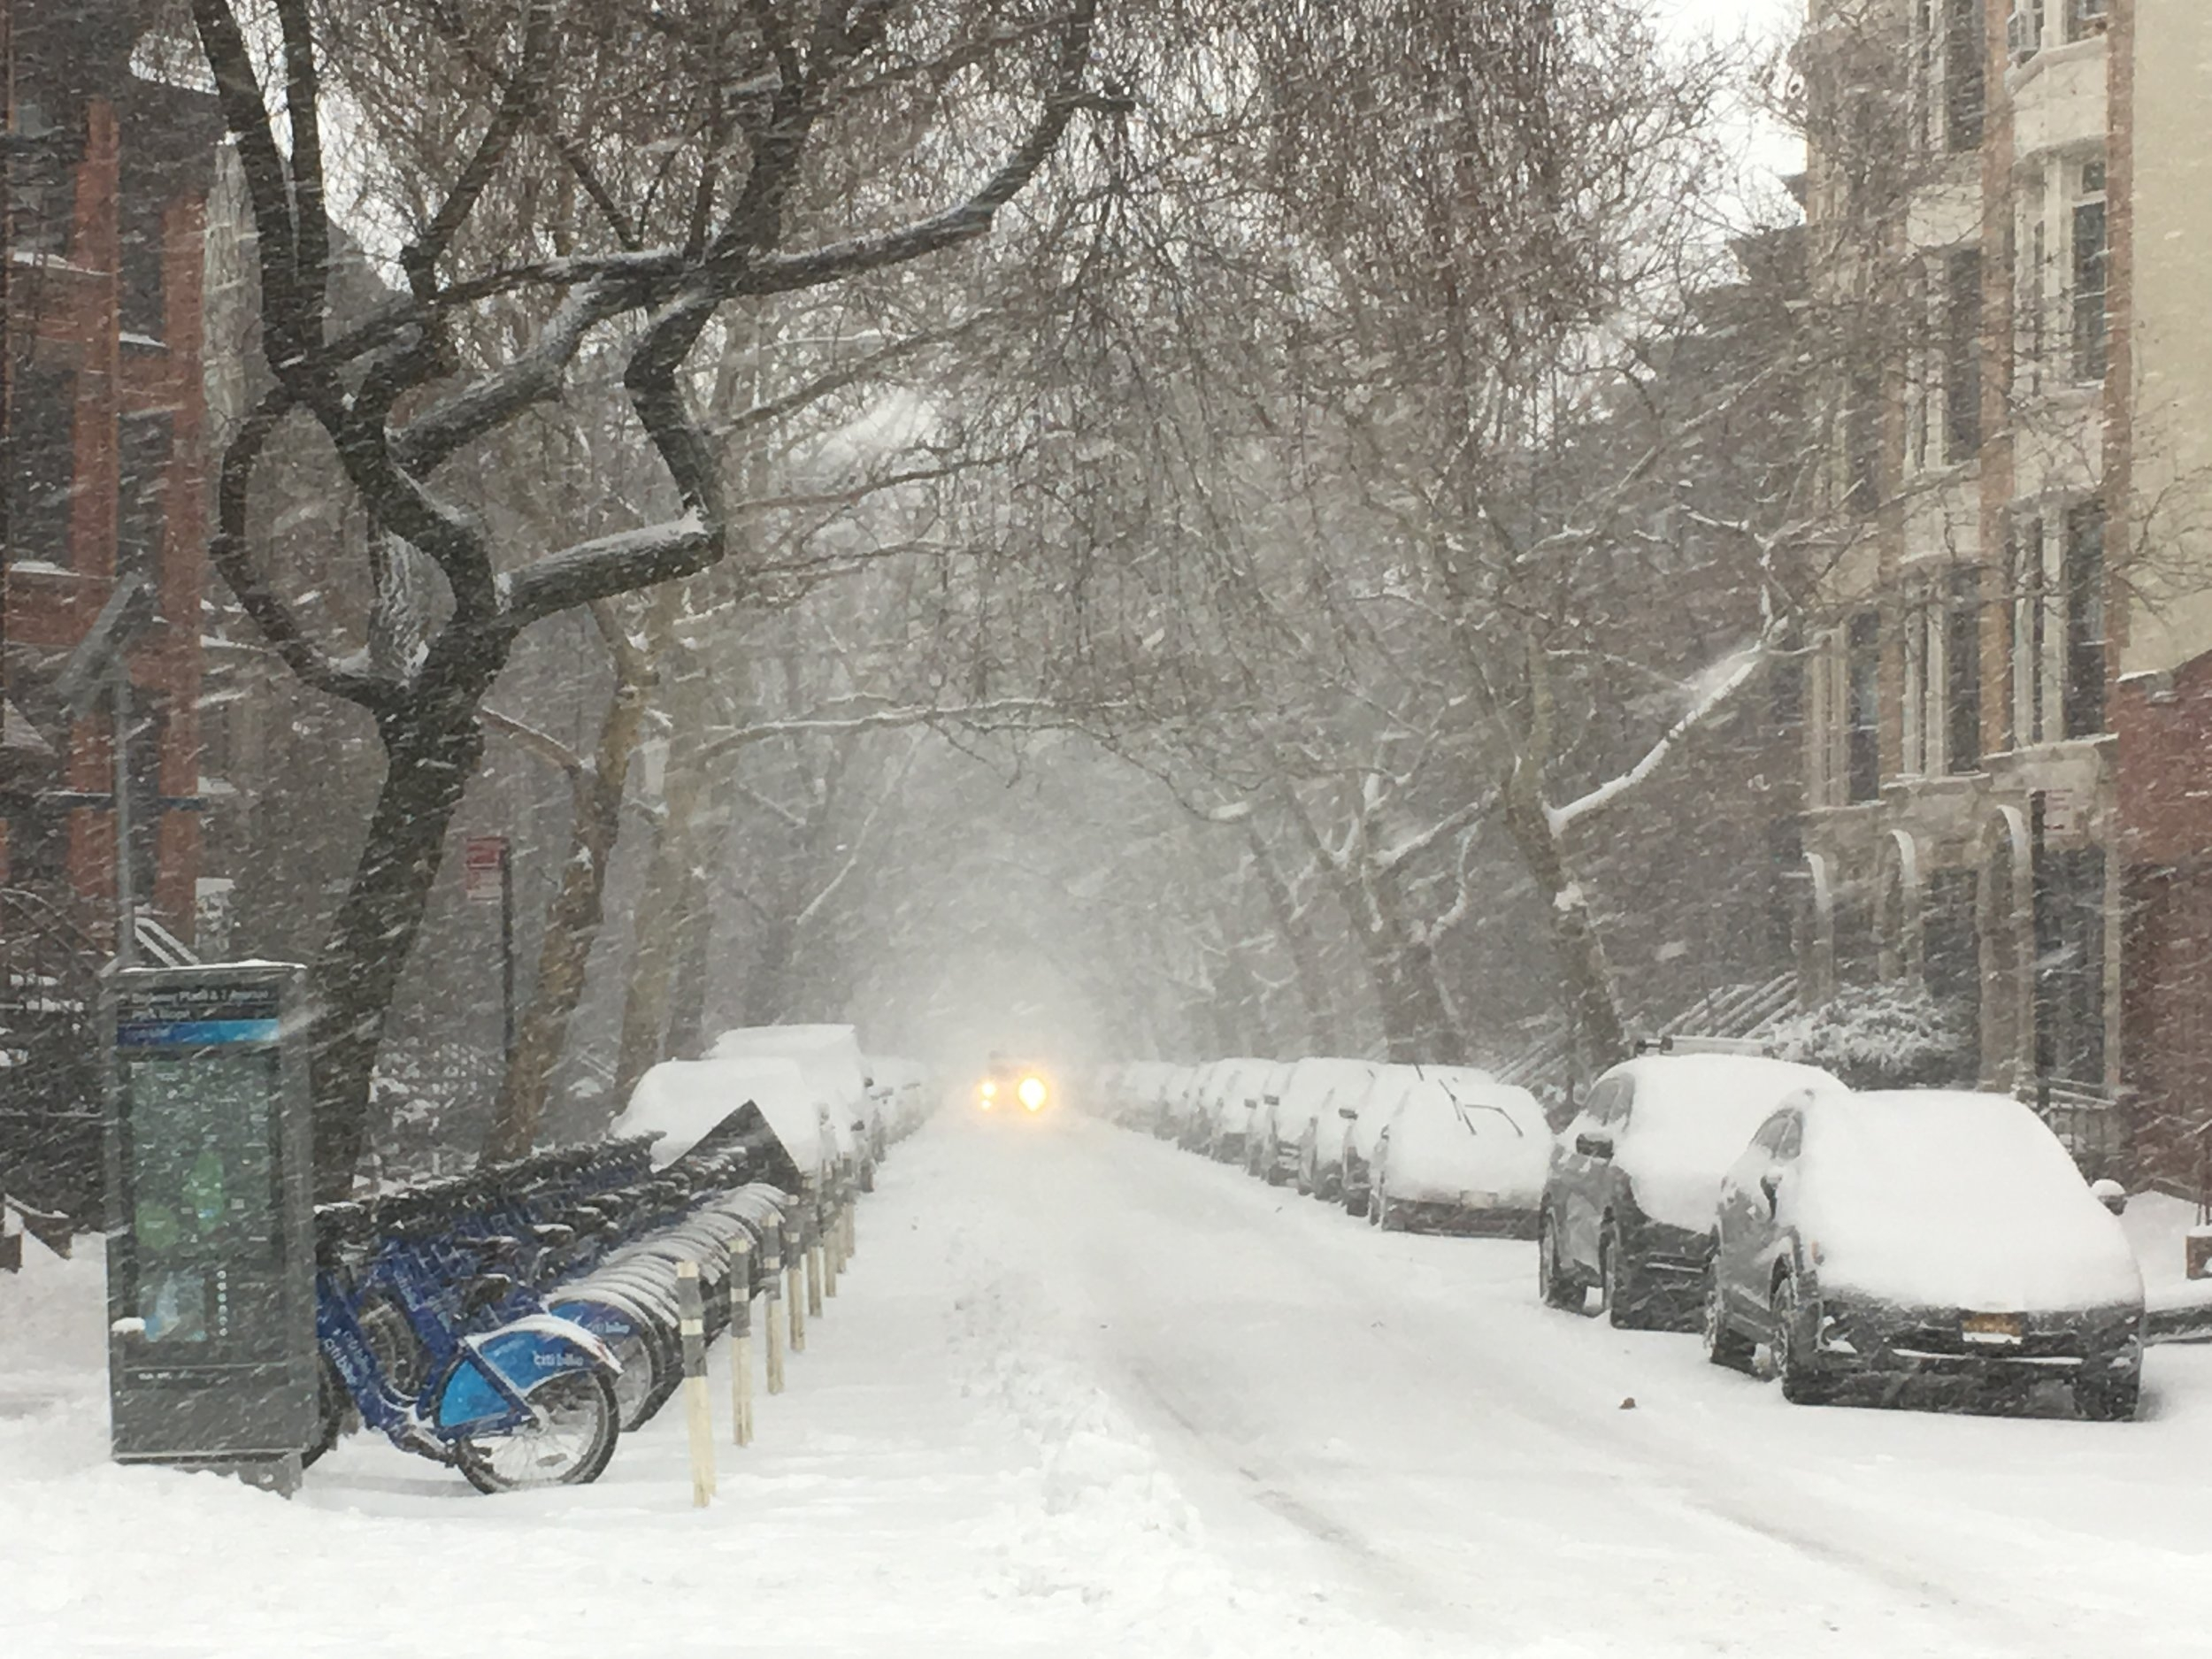 Berkeley Place. Park Slope, Brooklyn.